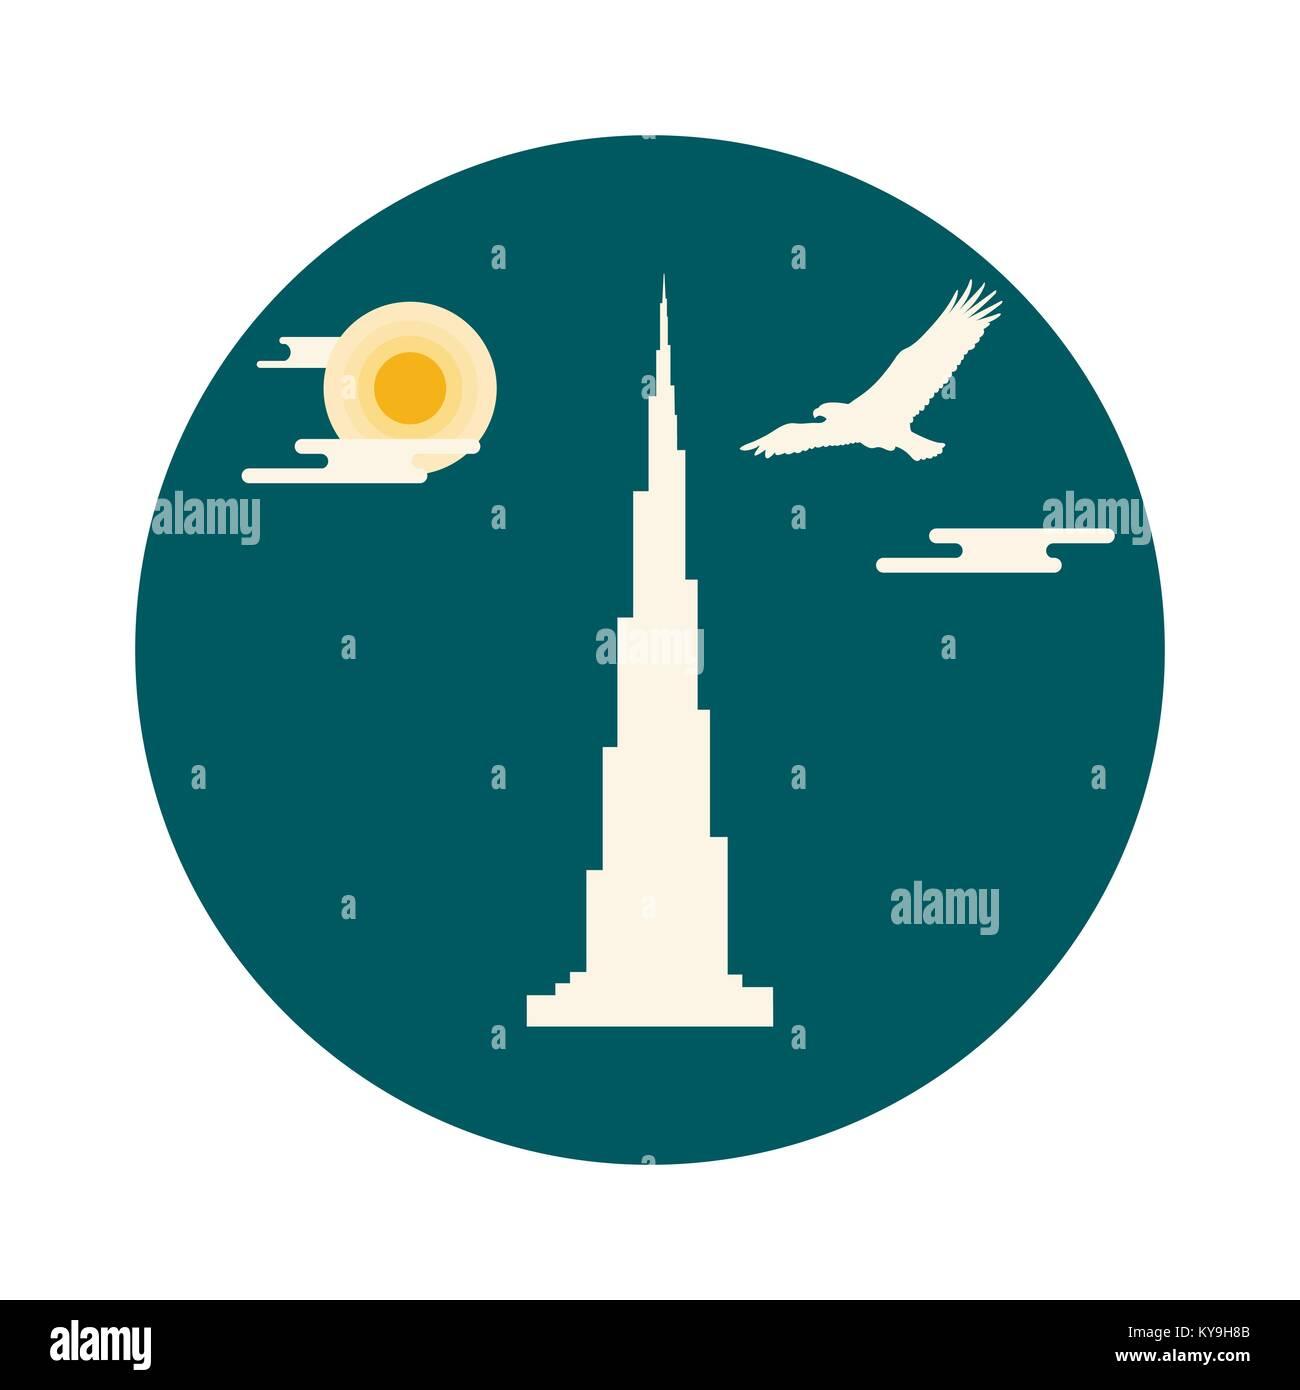 United Arab Emirates skyscraper silhouette. Dubai famous building and soaring falcon. Design for banner, poster - Stock Image